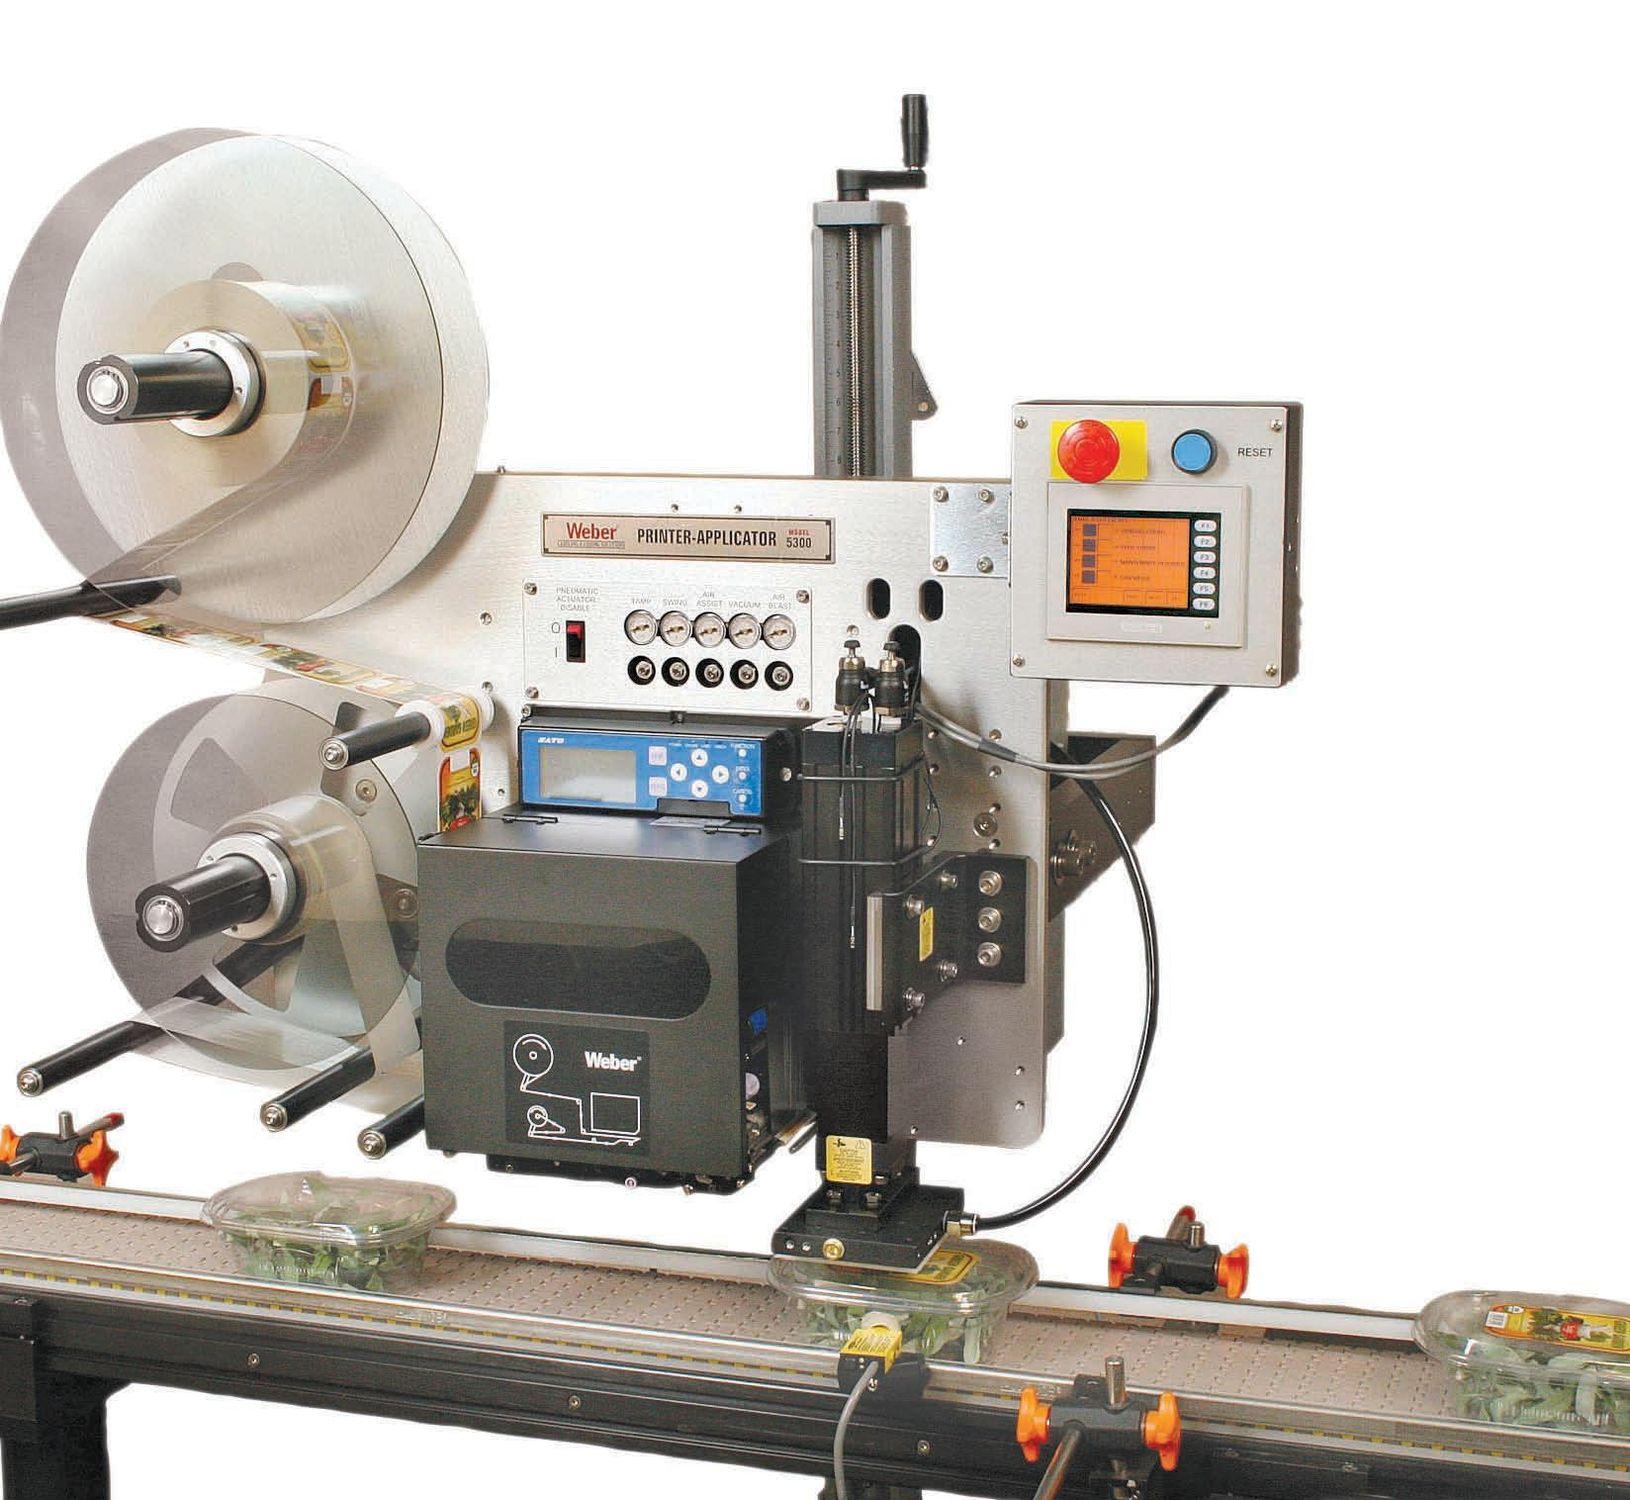 Color printer label - Thermal Transfer Label Printer Applicator Multi Color For Labels For Paper Max 180 X 500 Mm Legi Air 5300